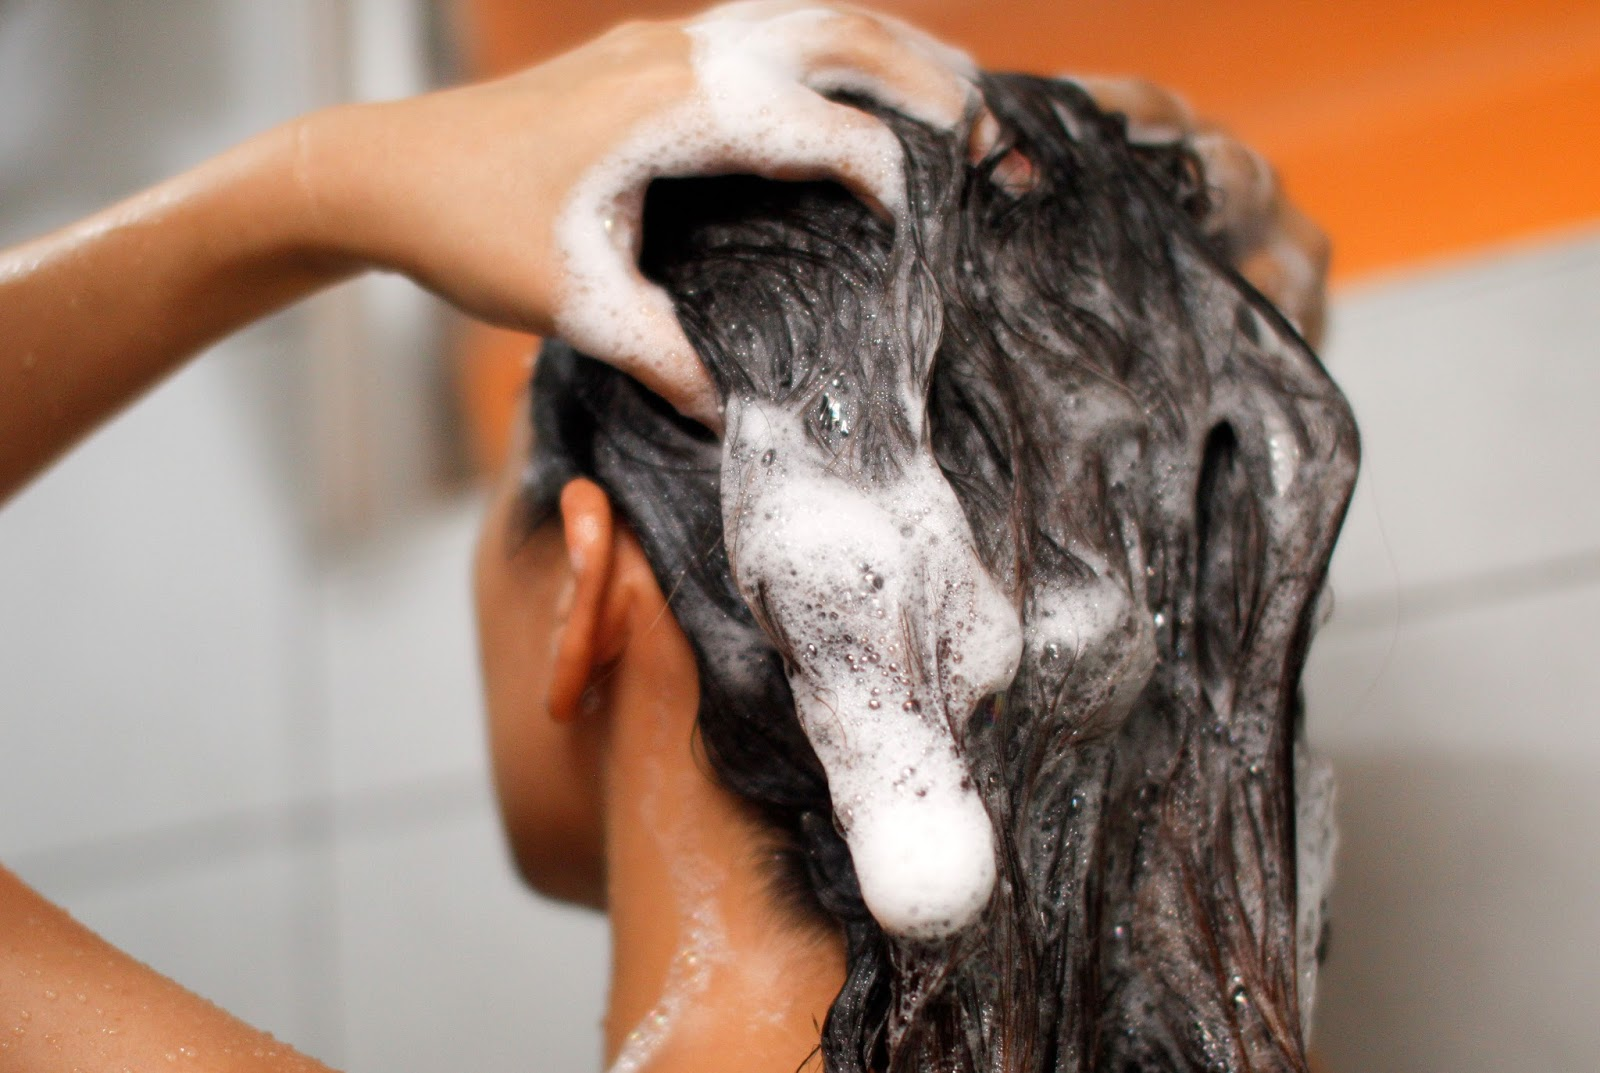 「washing hair」の画像検索結果